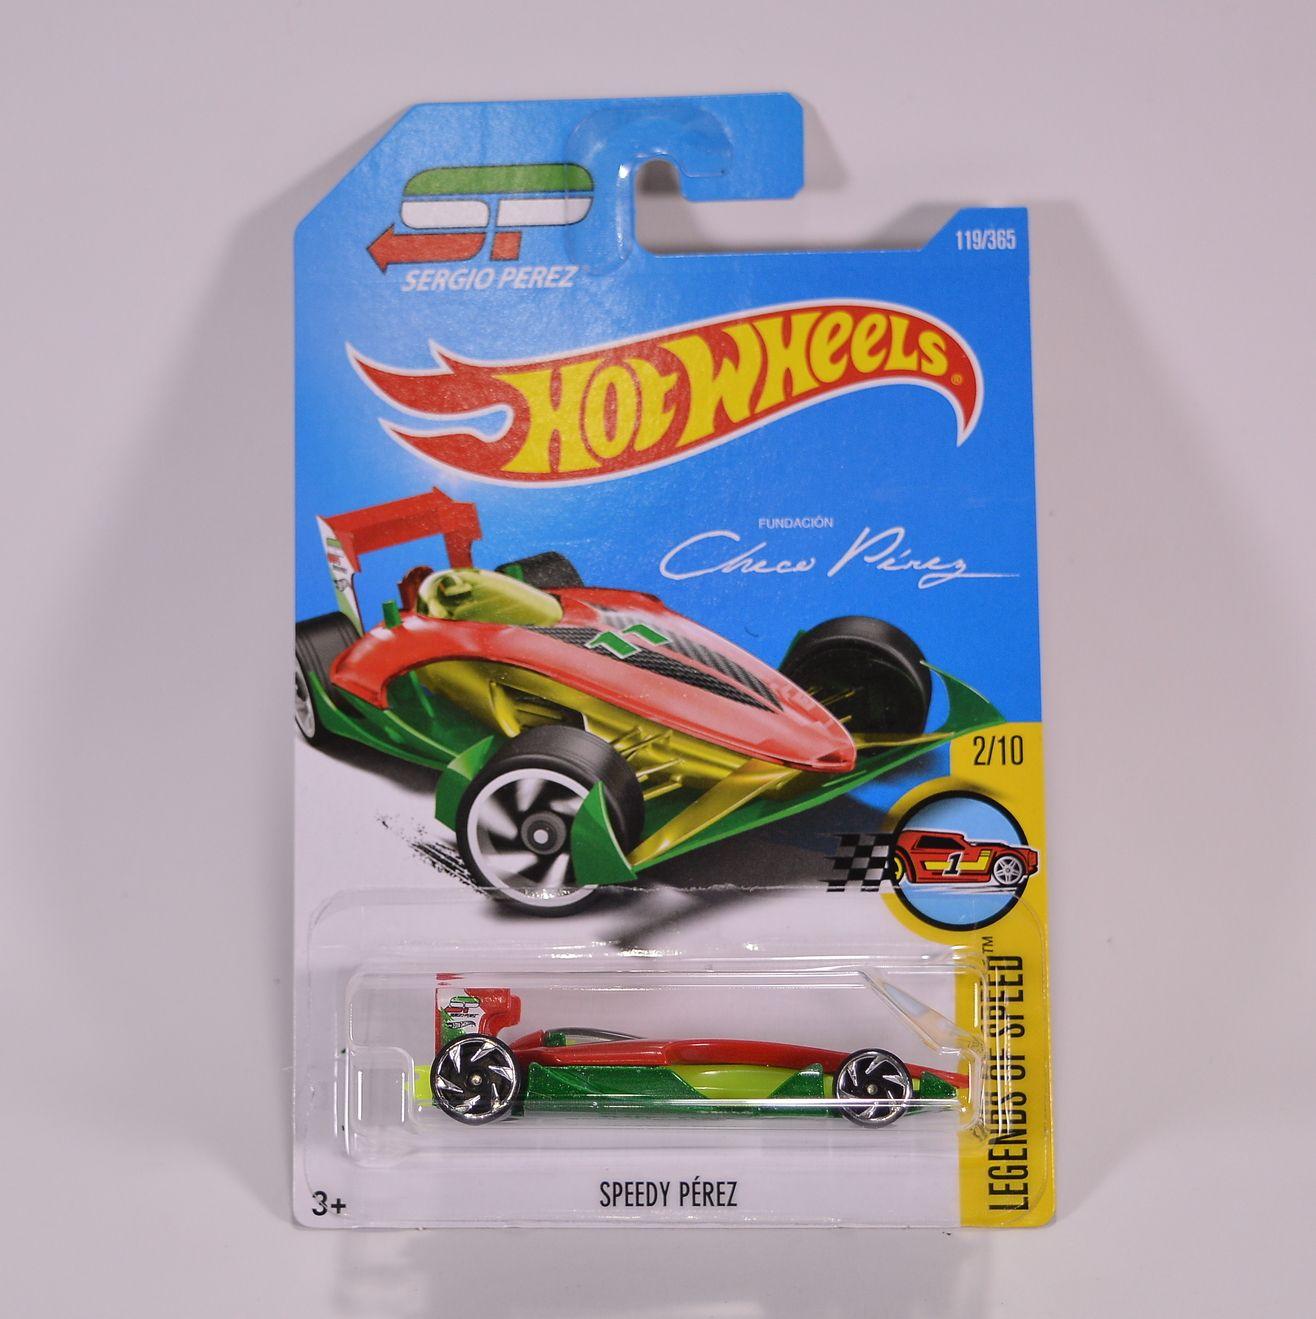 Hot Wheels Speedy Perez